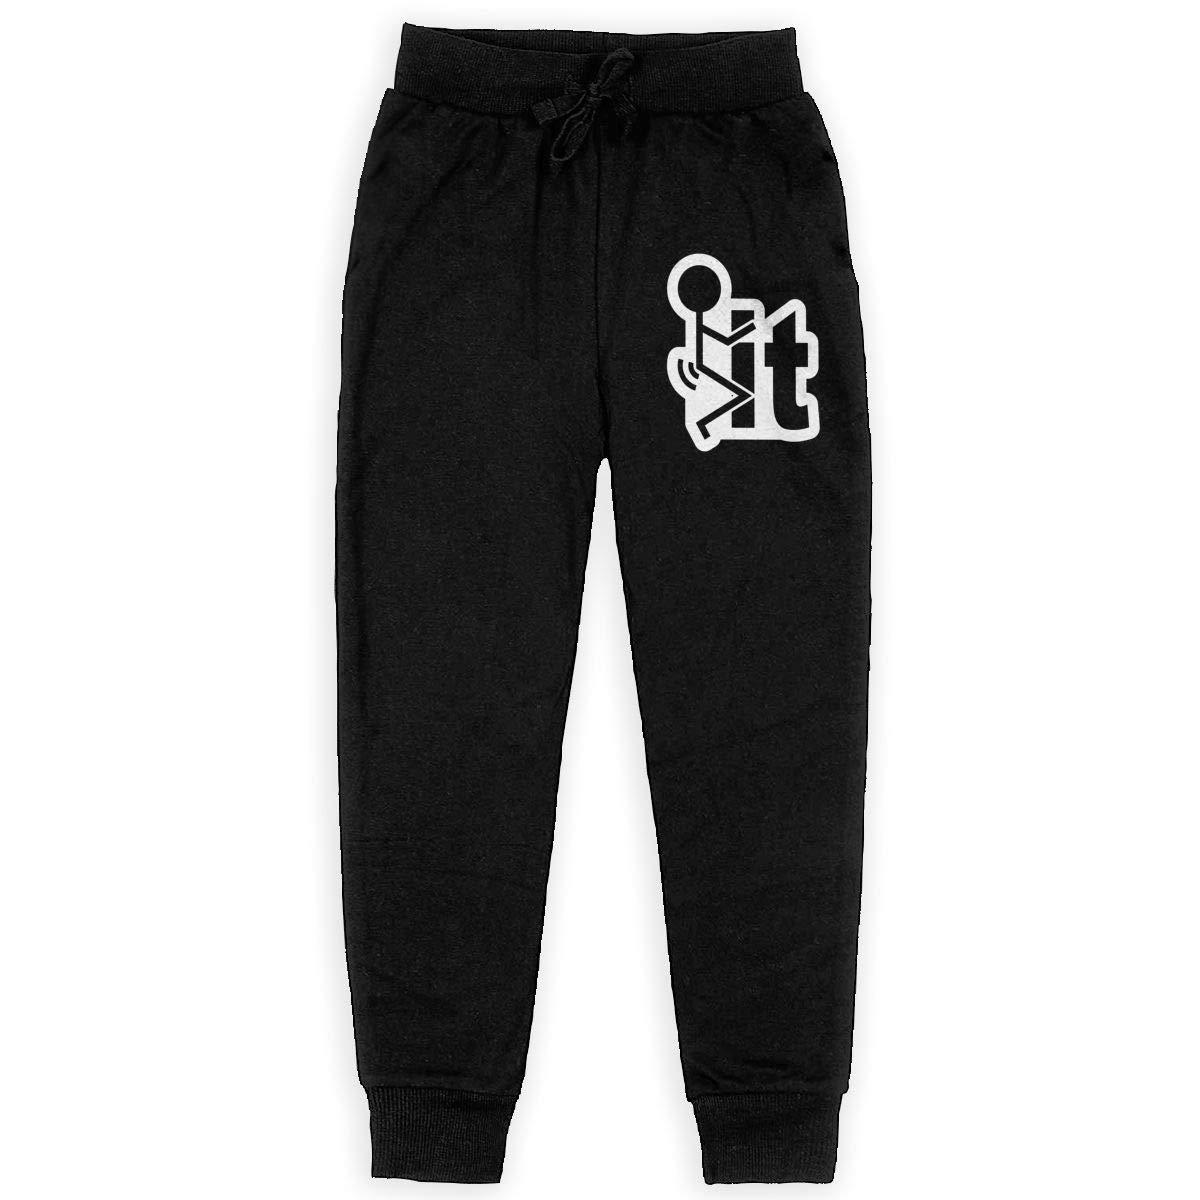 Dunpaiaa Fuck It Boys Sweatpants,Joggers Sport Training Pants Trousers Black